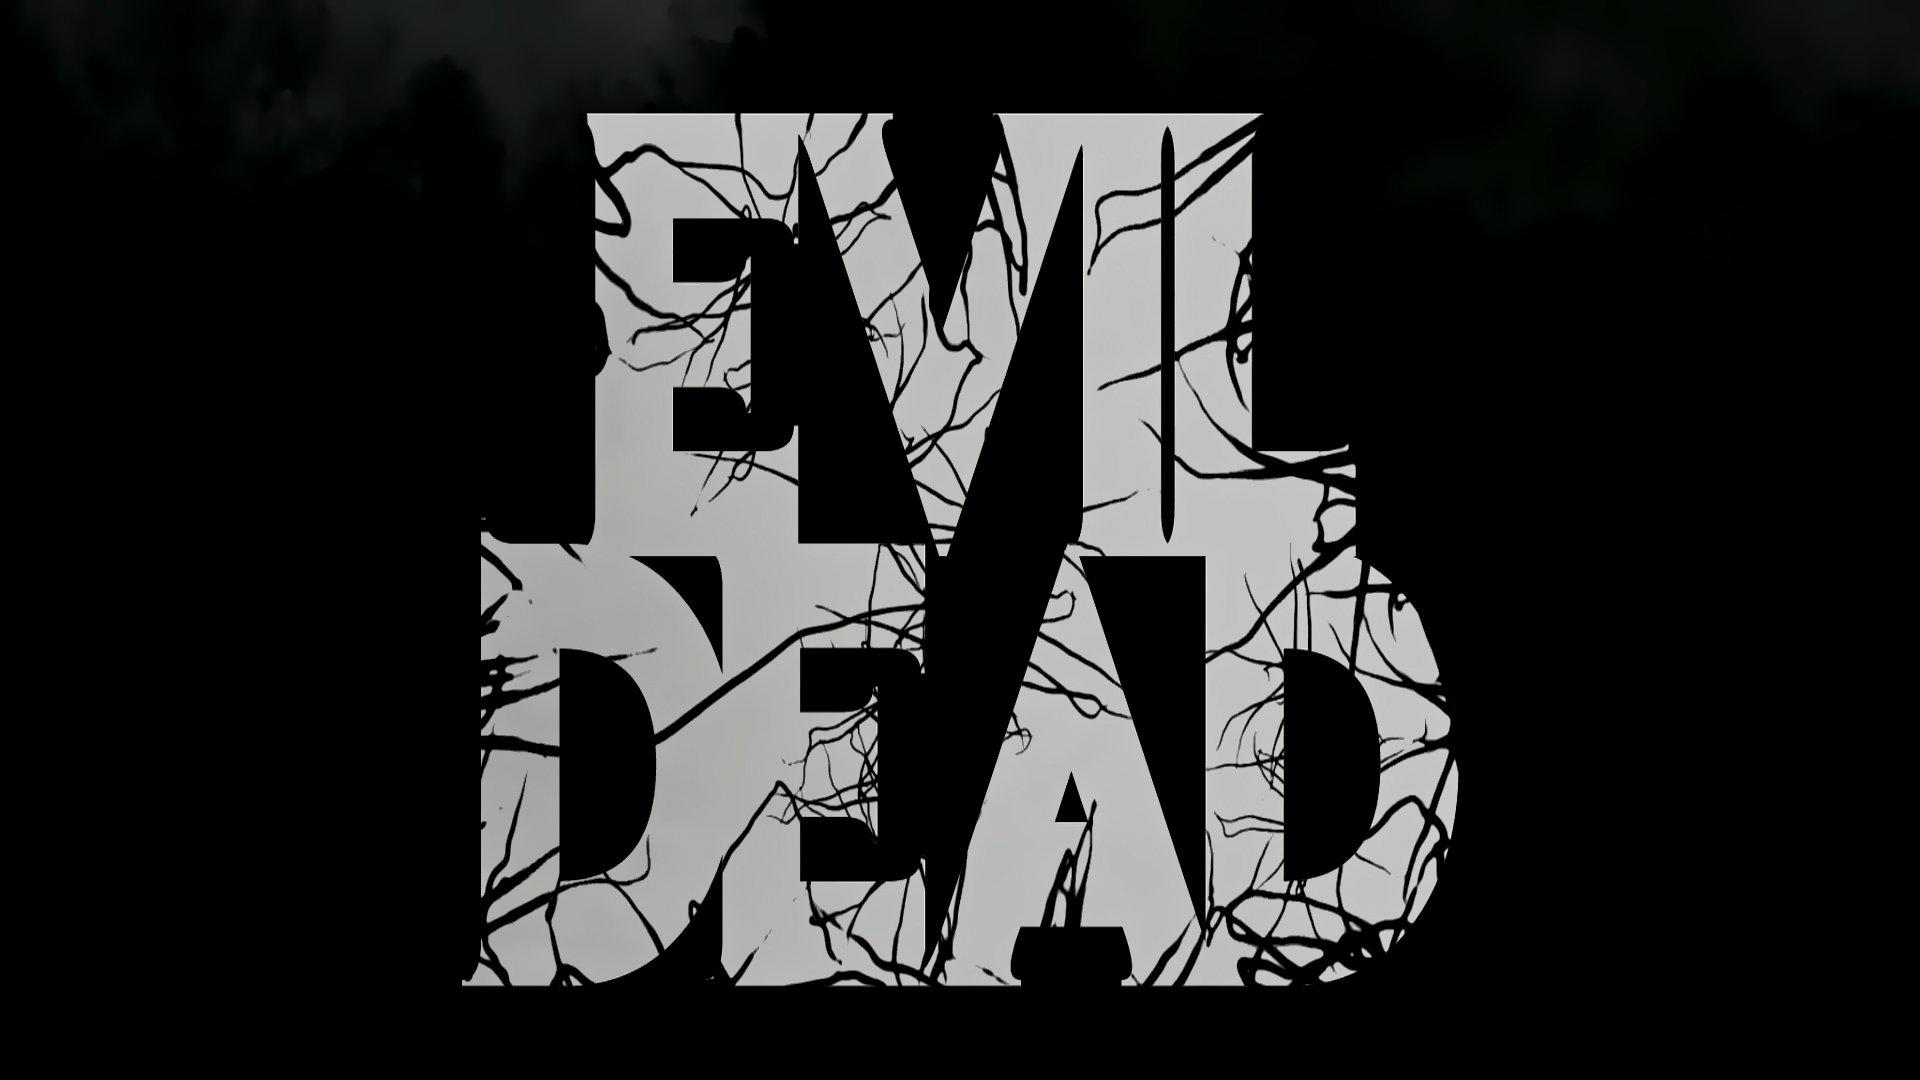 Evil-Dead-wallpaper-9.jpg